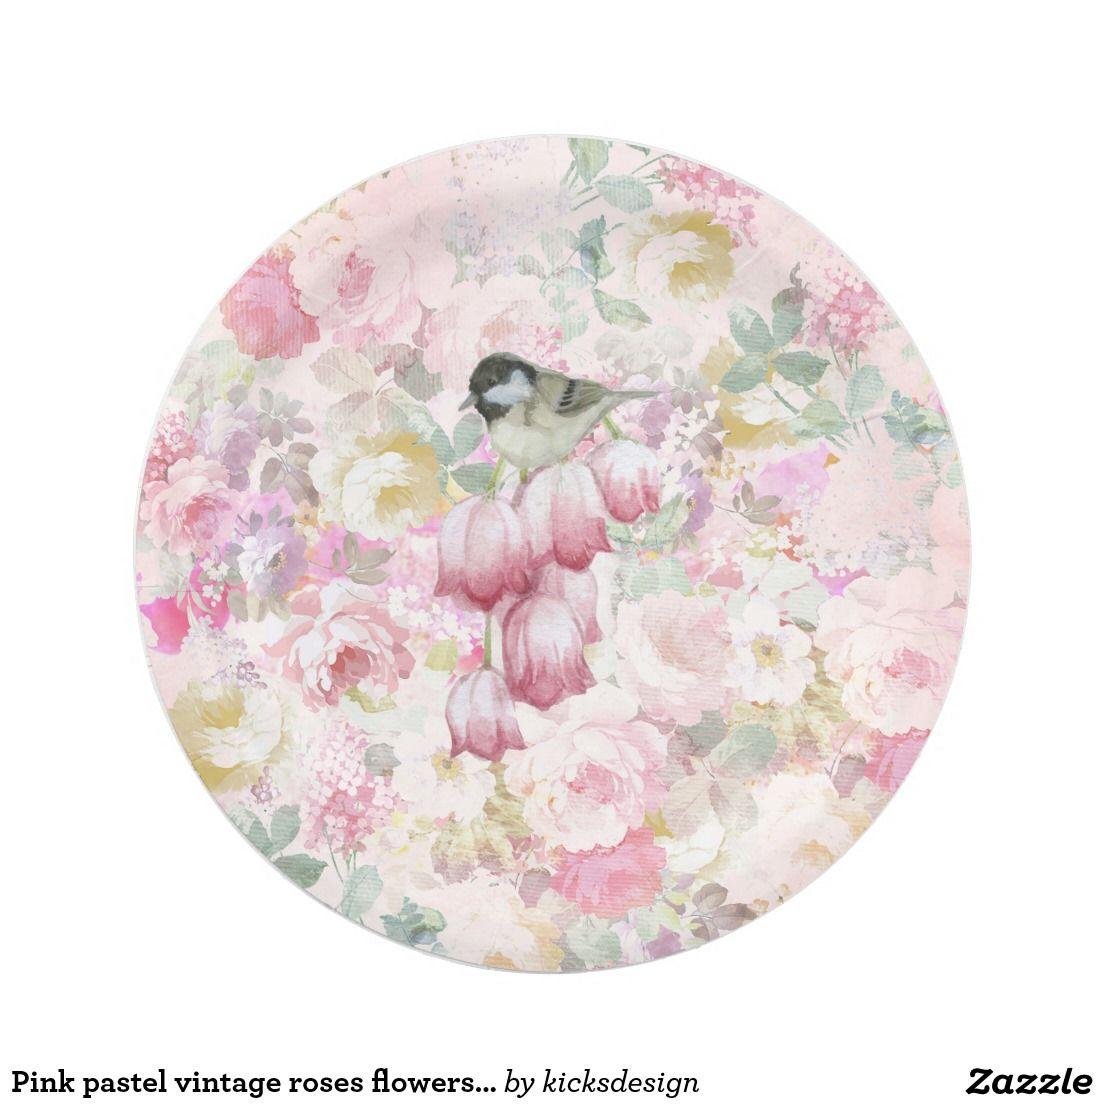 Pink pastel vintage roses flowers bird painting paper plate | shower ...